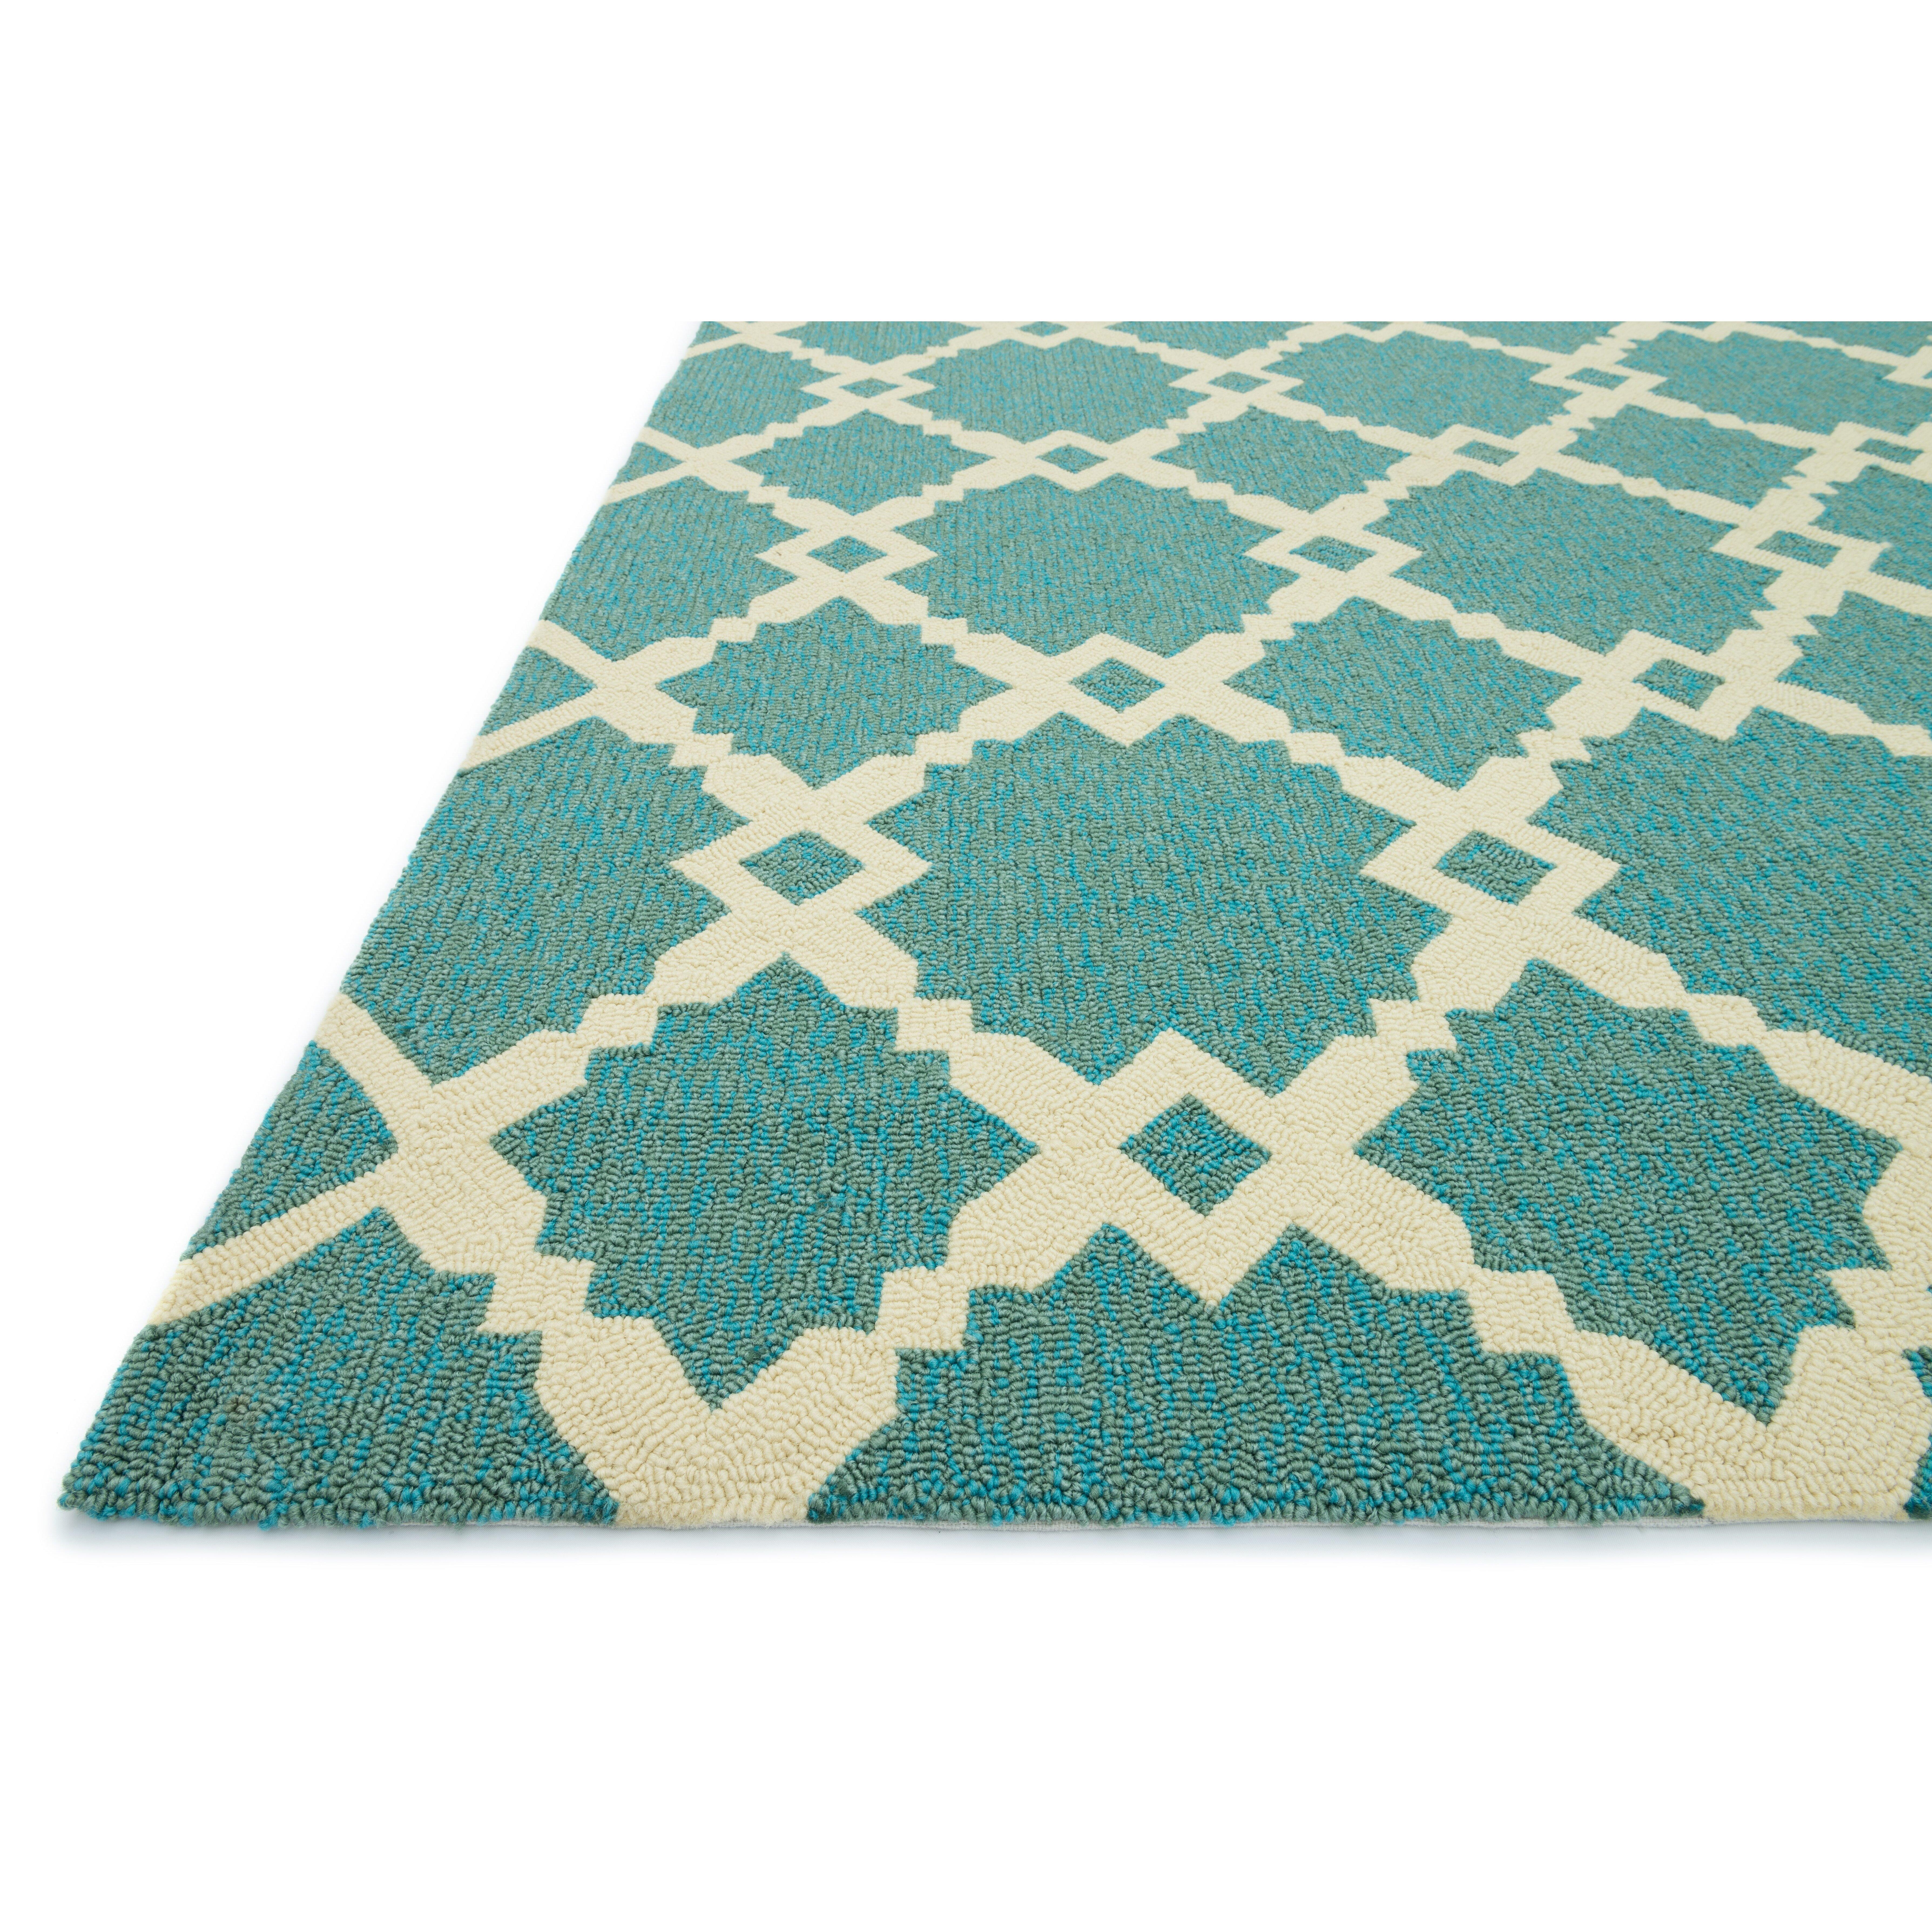 Loloi Rugs Ventura Geometric Turquoise Ivory Indoor